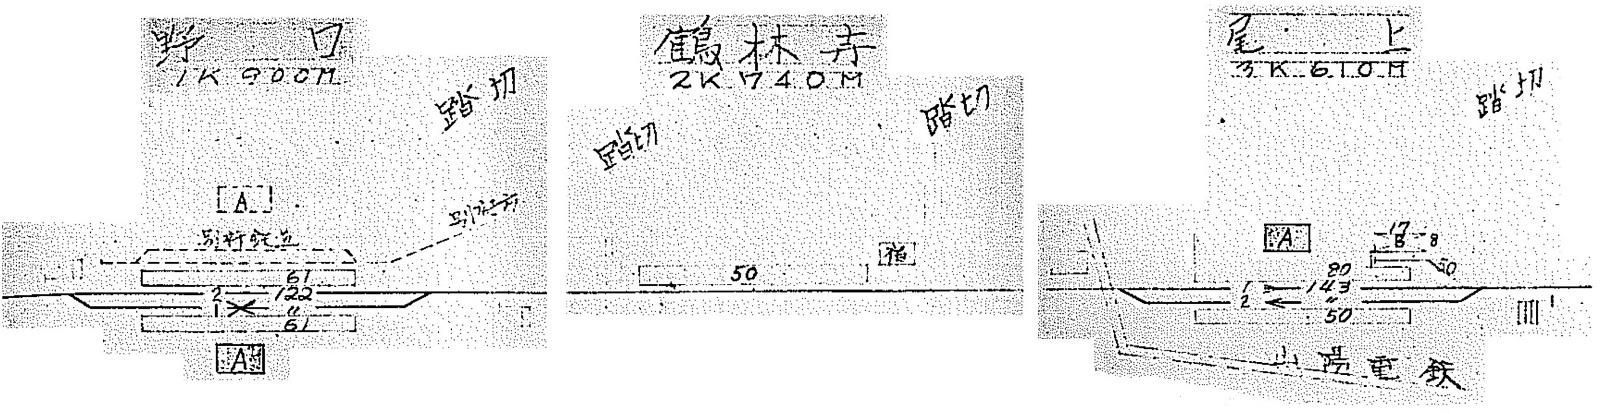 1959011r